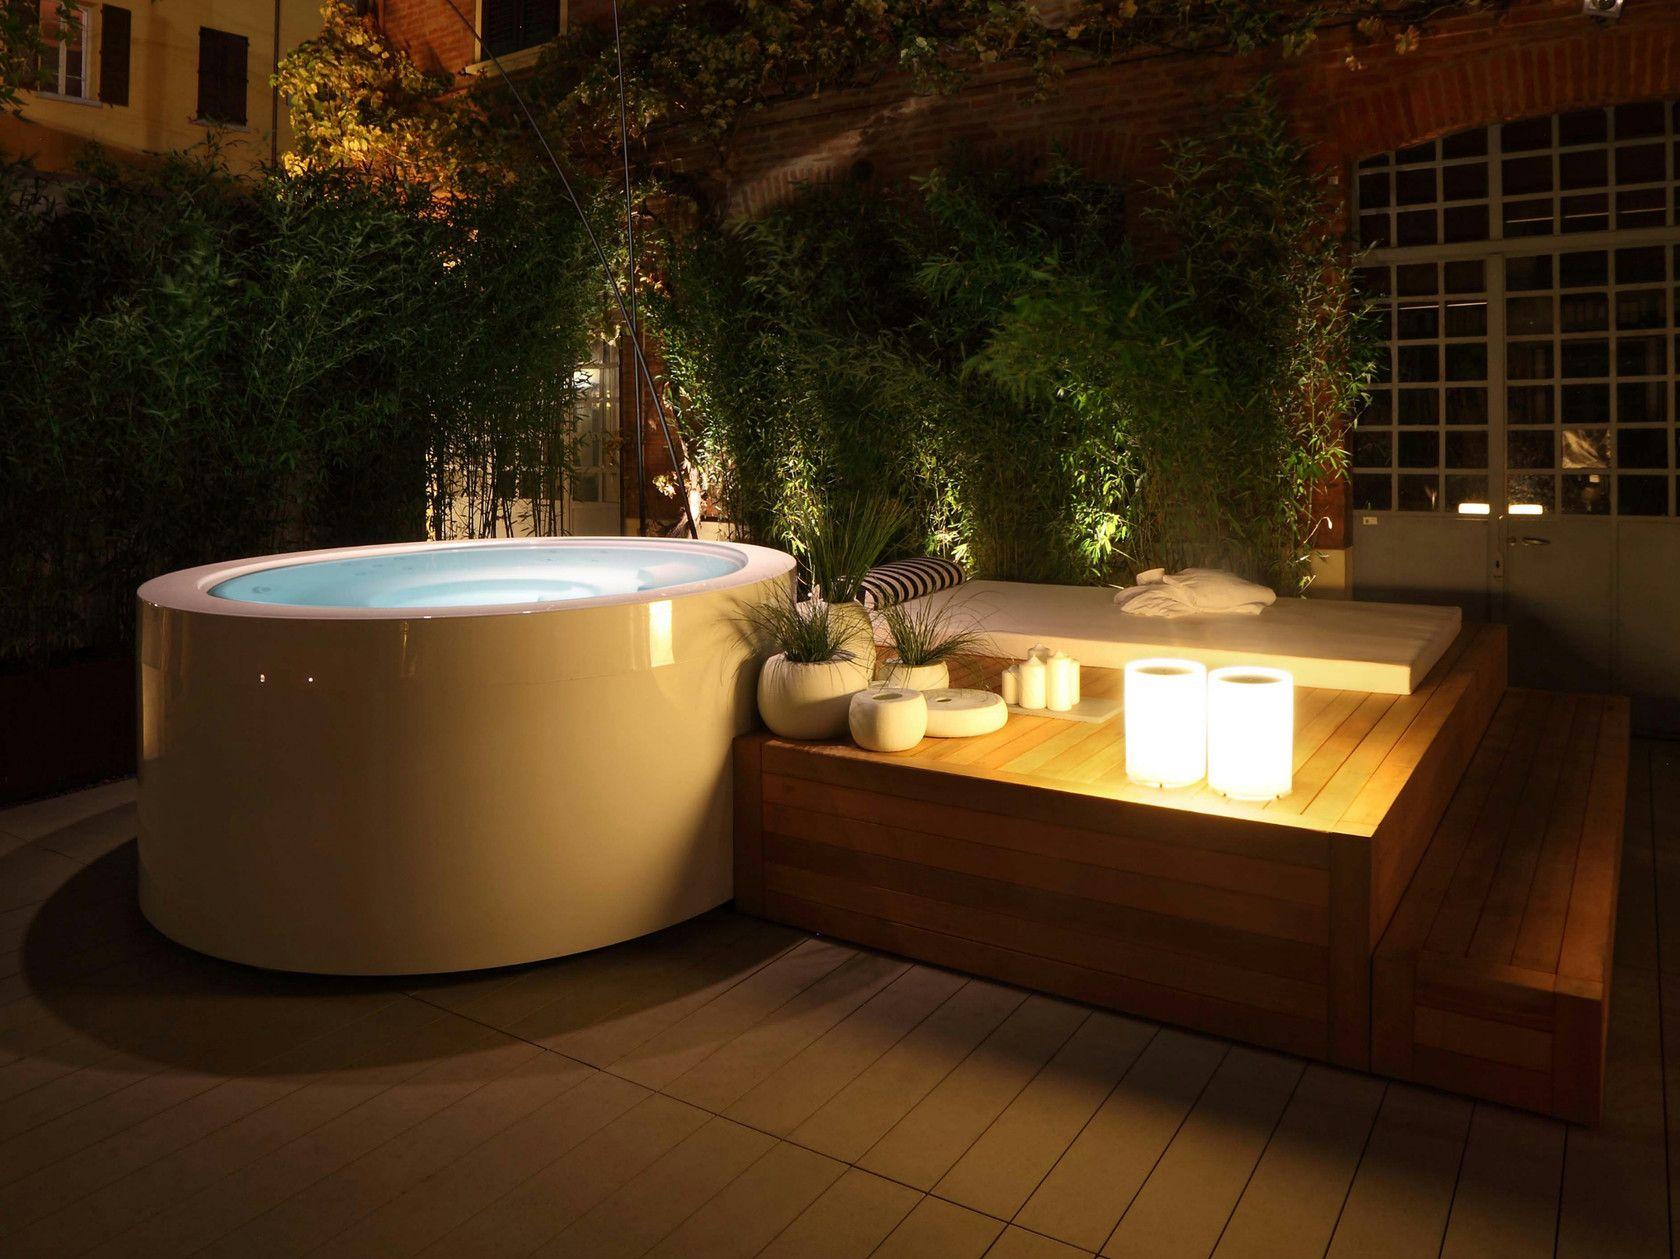 Minipool Round Hot Tub By Kos By Zucchetti Design Ludovica Roberto Palomba In 2020 Round Hot Tub Hot Tub Garden Hot Tub Designs Modern outdoor jacuzzi tub